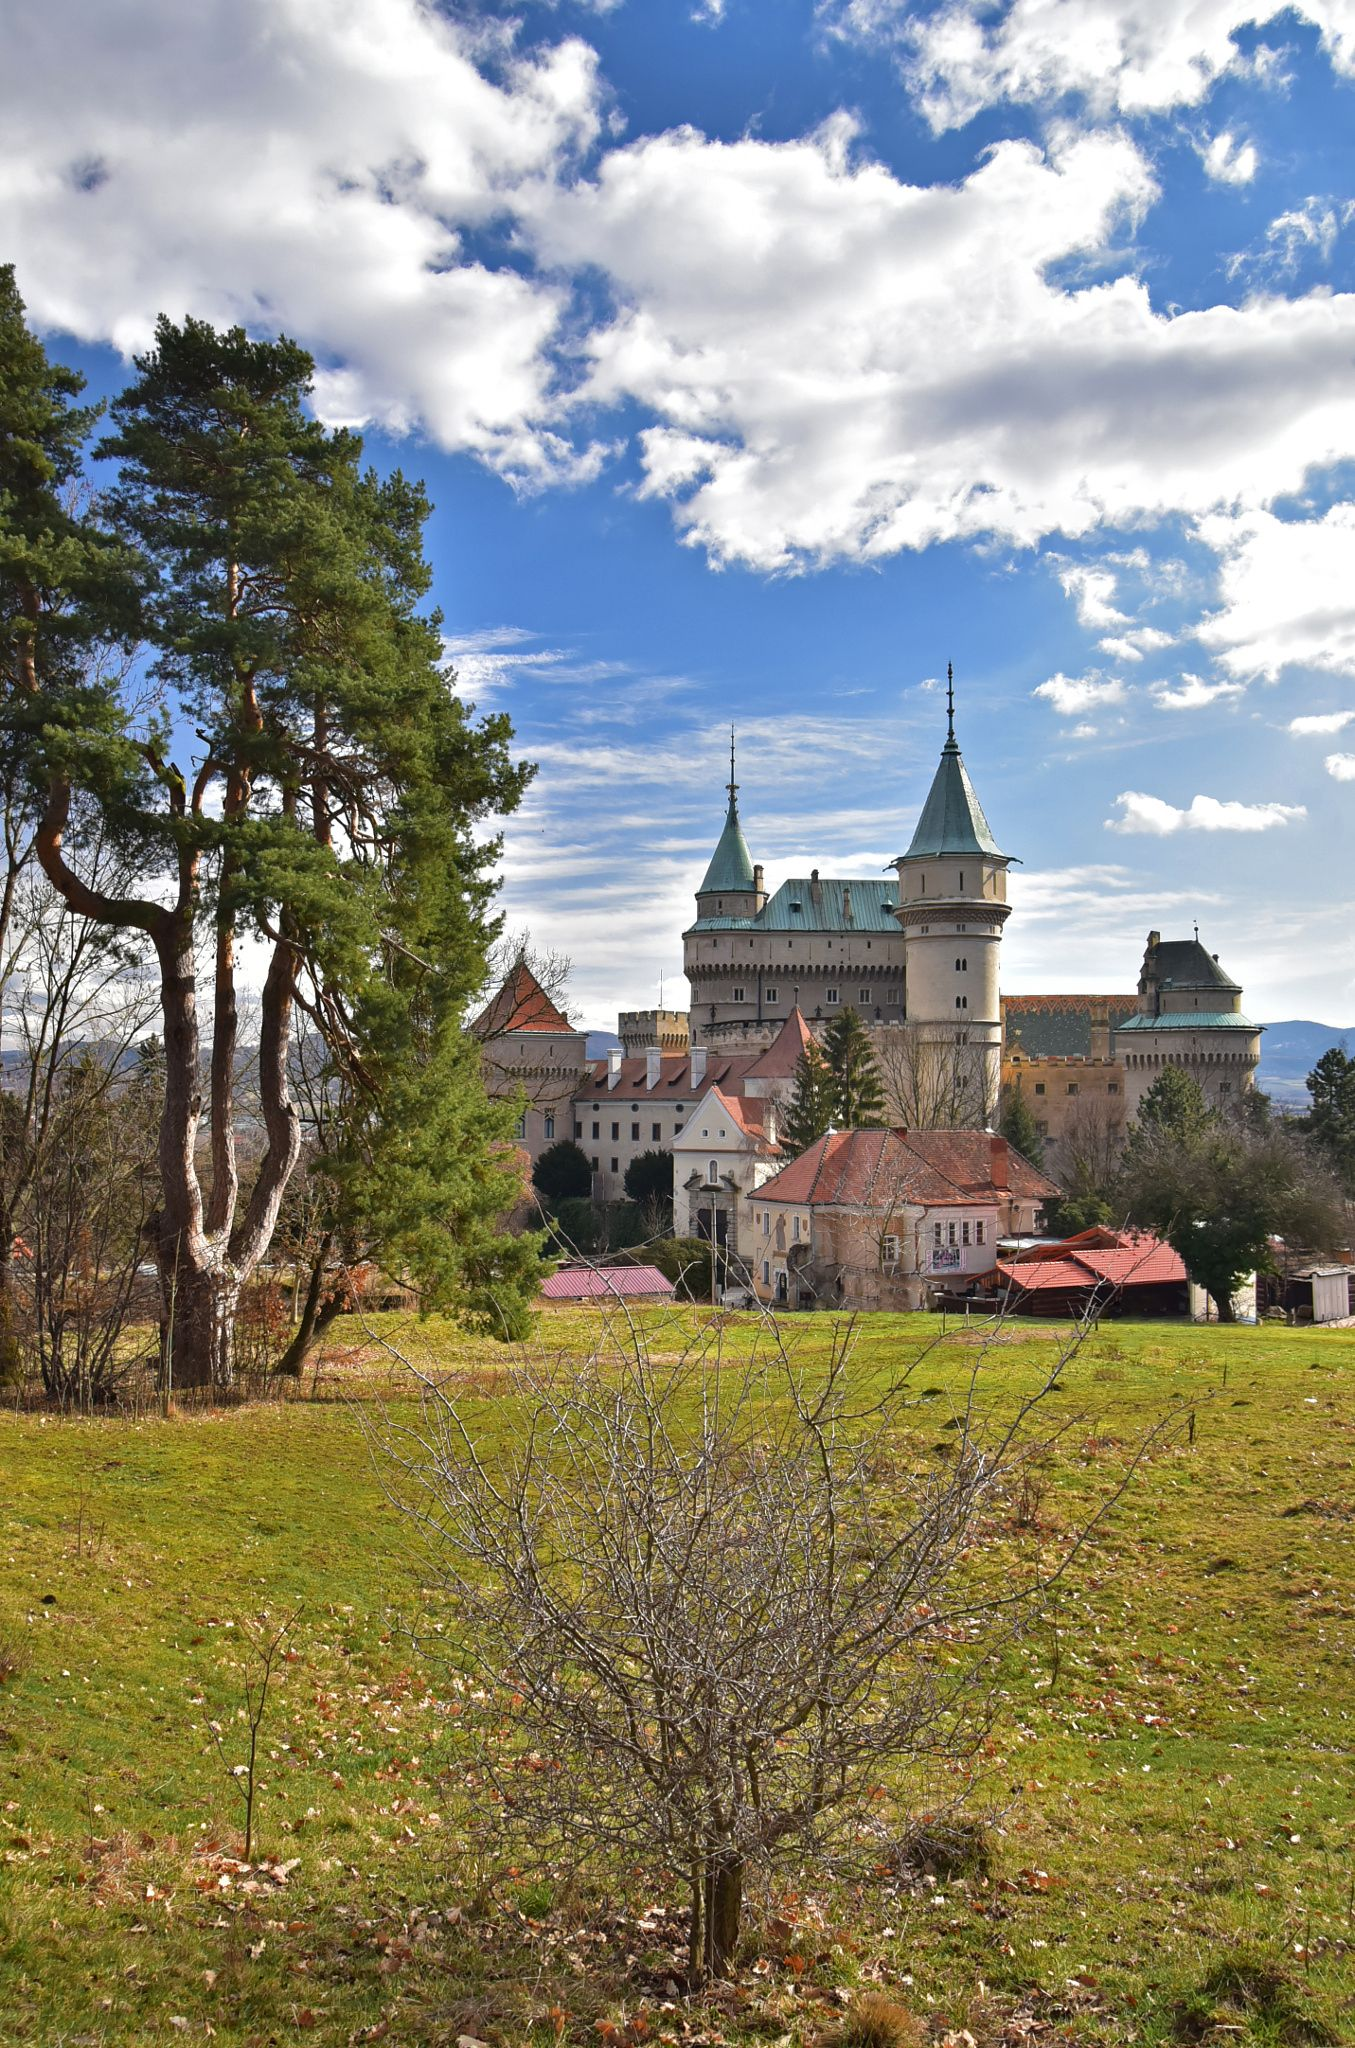 Slovakia - Igor Supuka 181 - Europe, Slovak republic, Bojnický castle near Prievidza city in central Slovakia